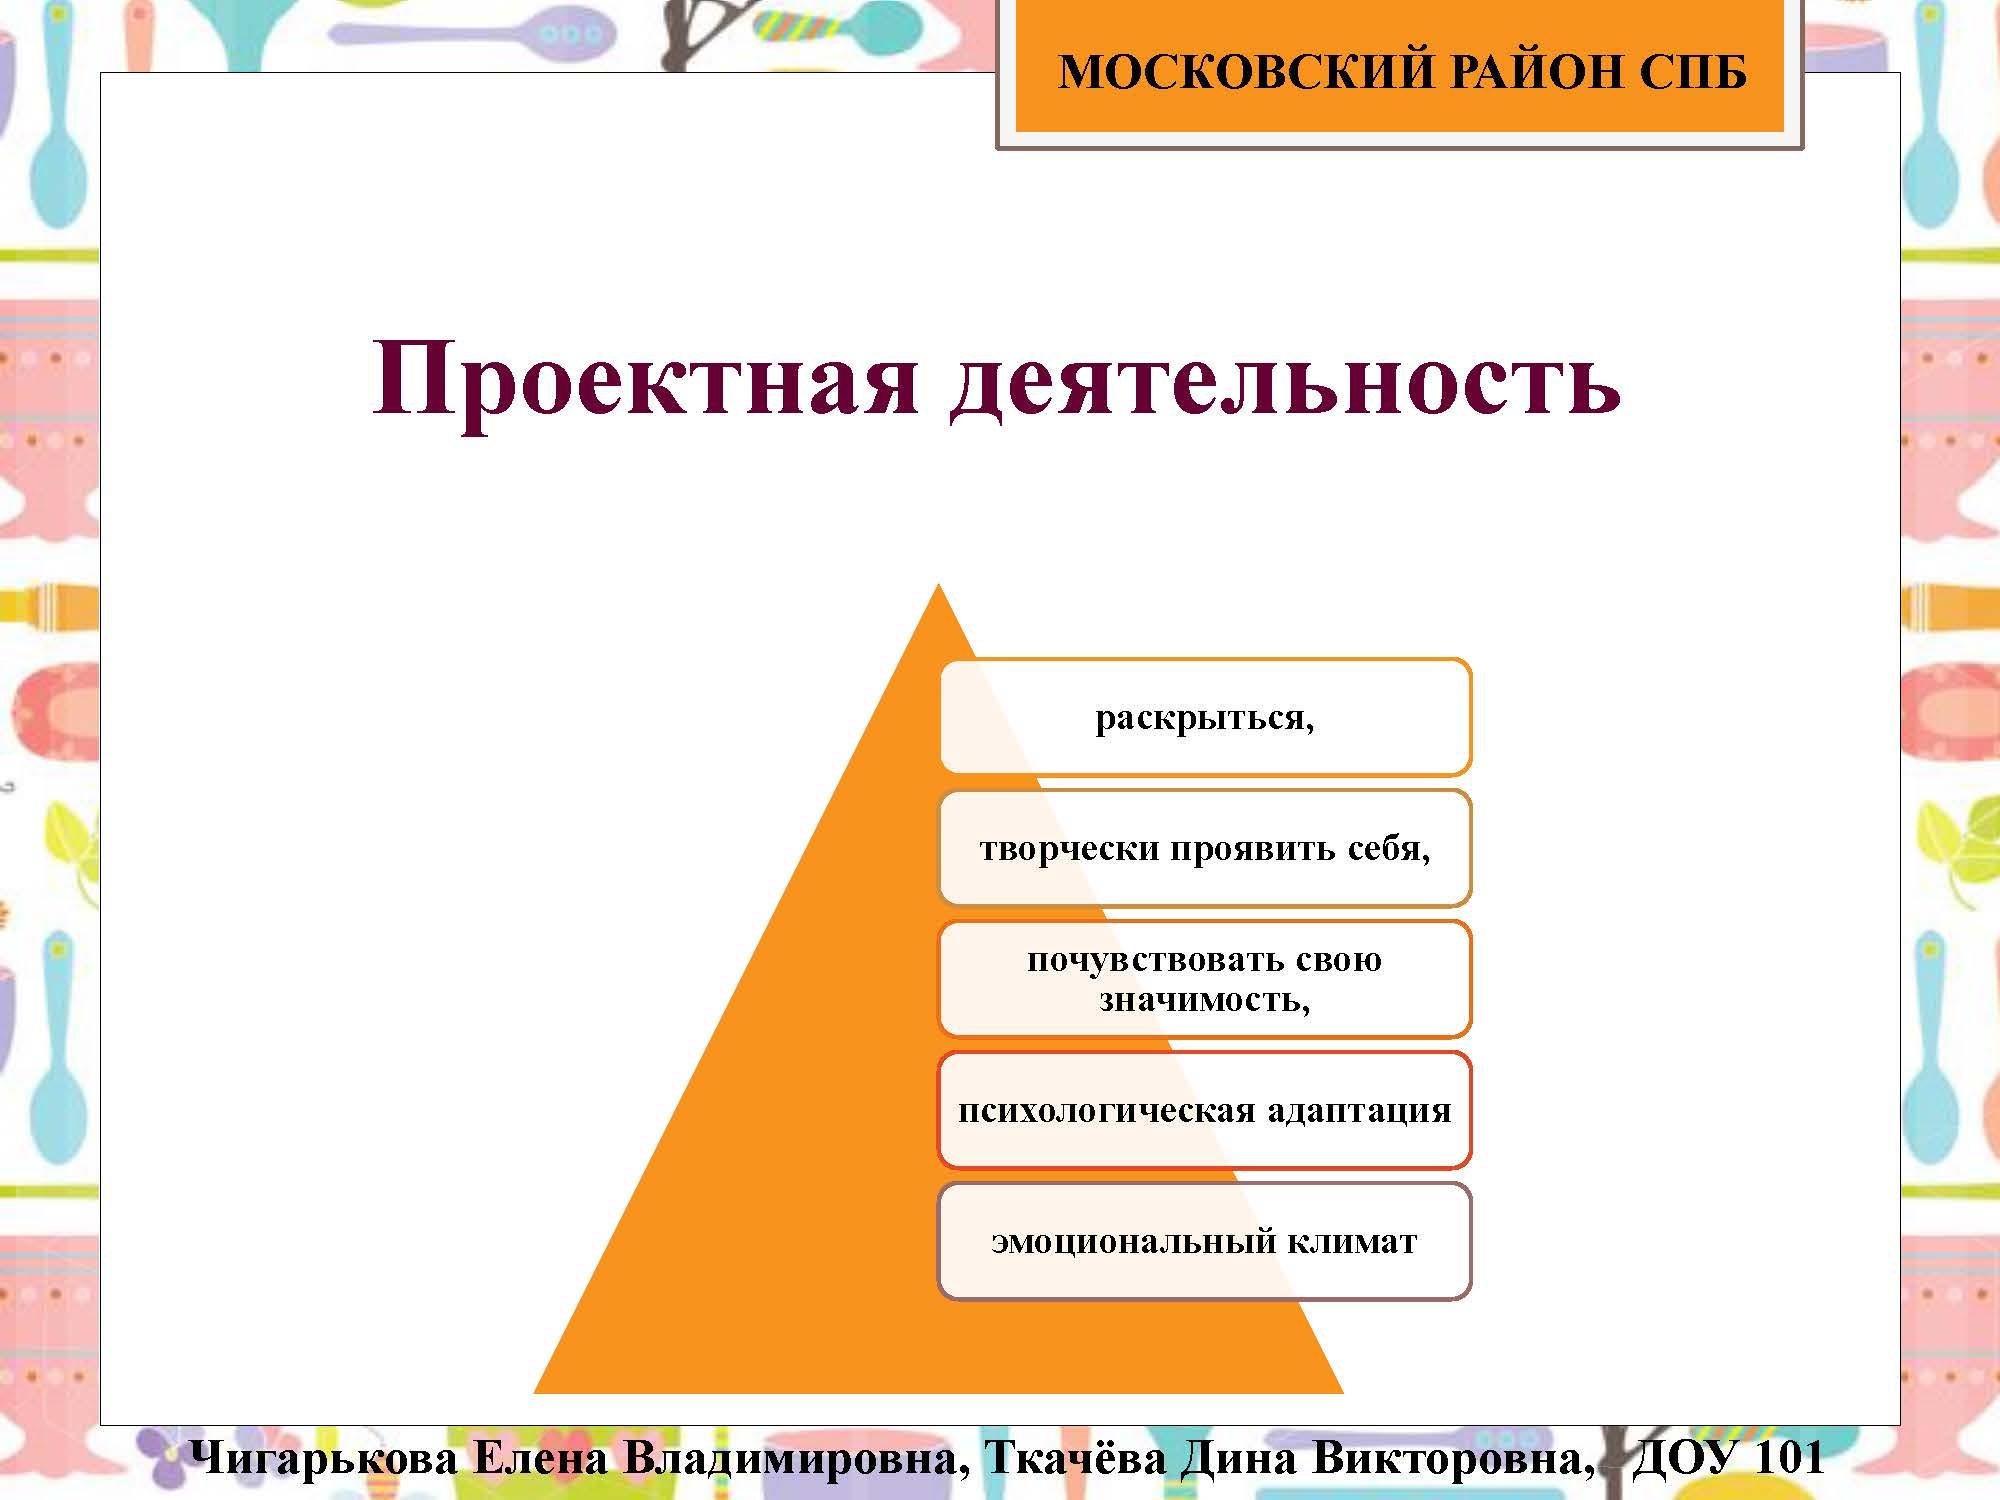 Секция 8. ДОУ 101, ПСИ. Московский район_Страница_03